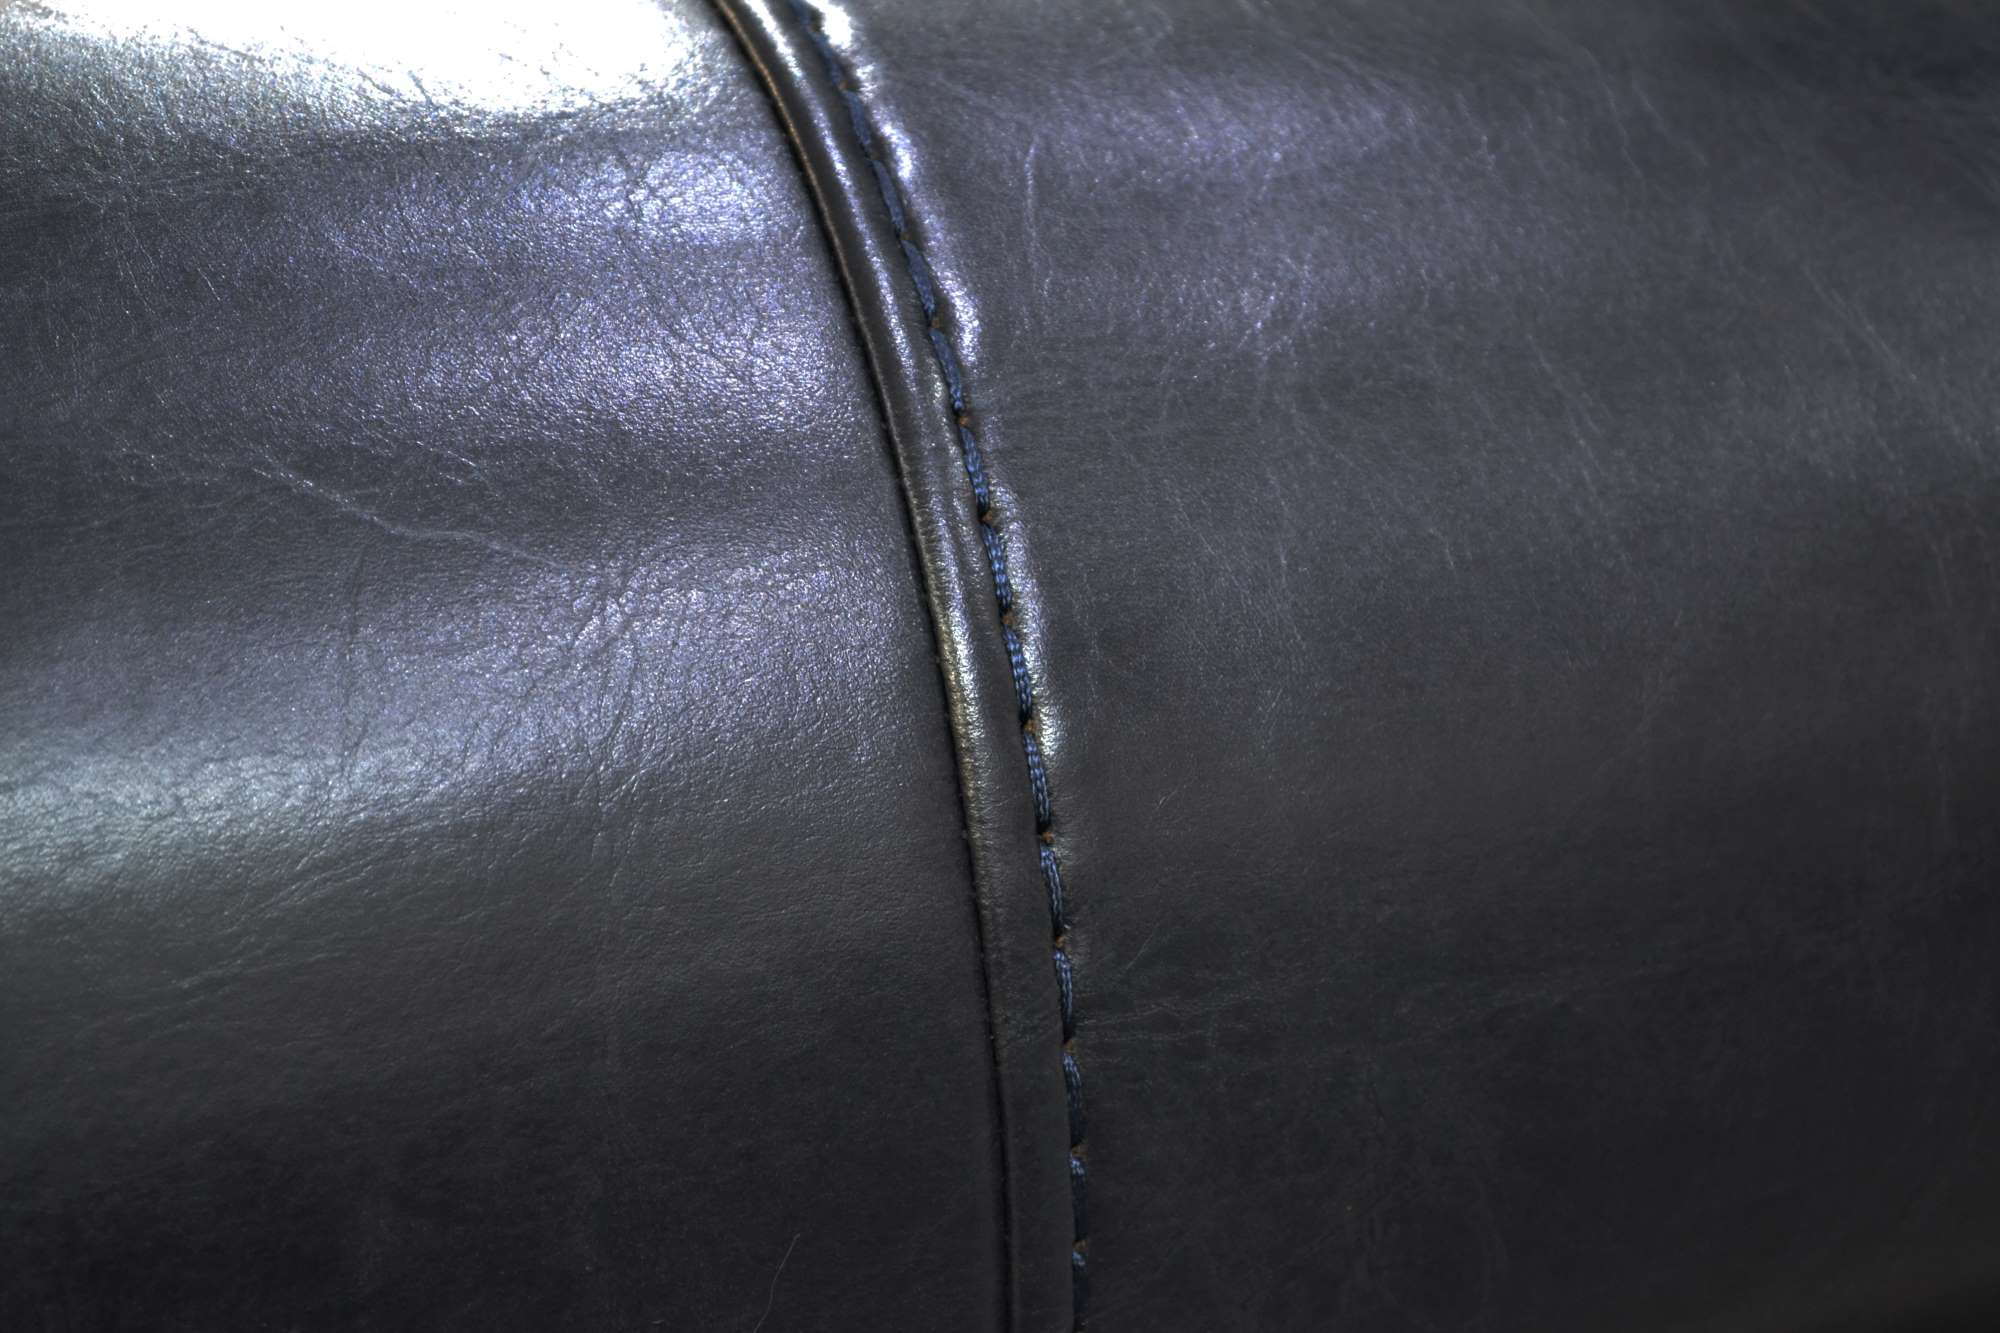 LRPX2508 Stitching